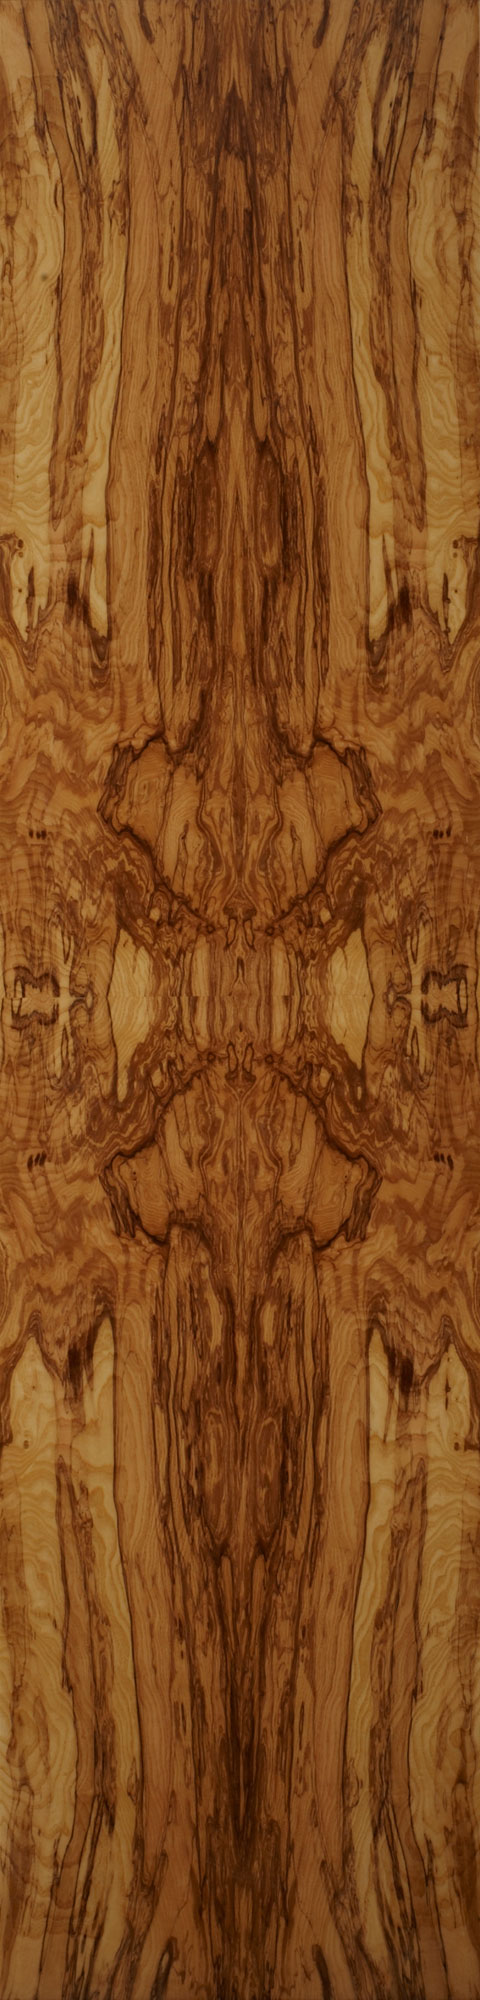 oliv esche schorn groh furniere veneers. Black Bedroom Furniture Sets. Home Design Ideas